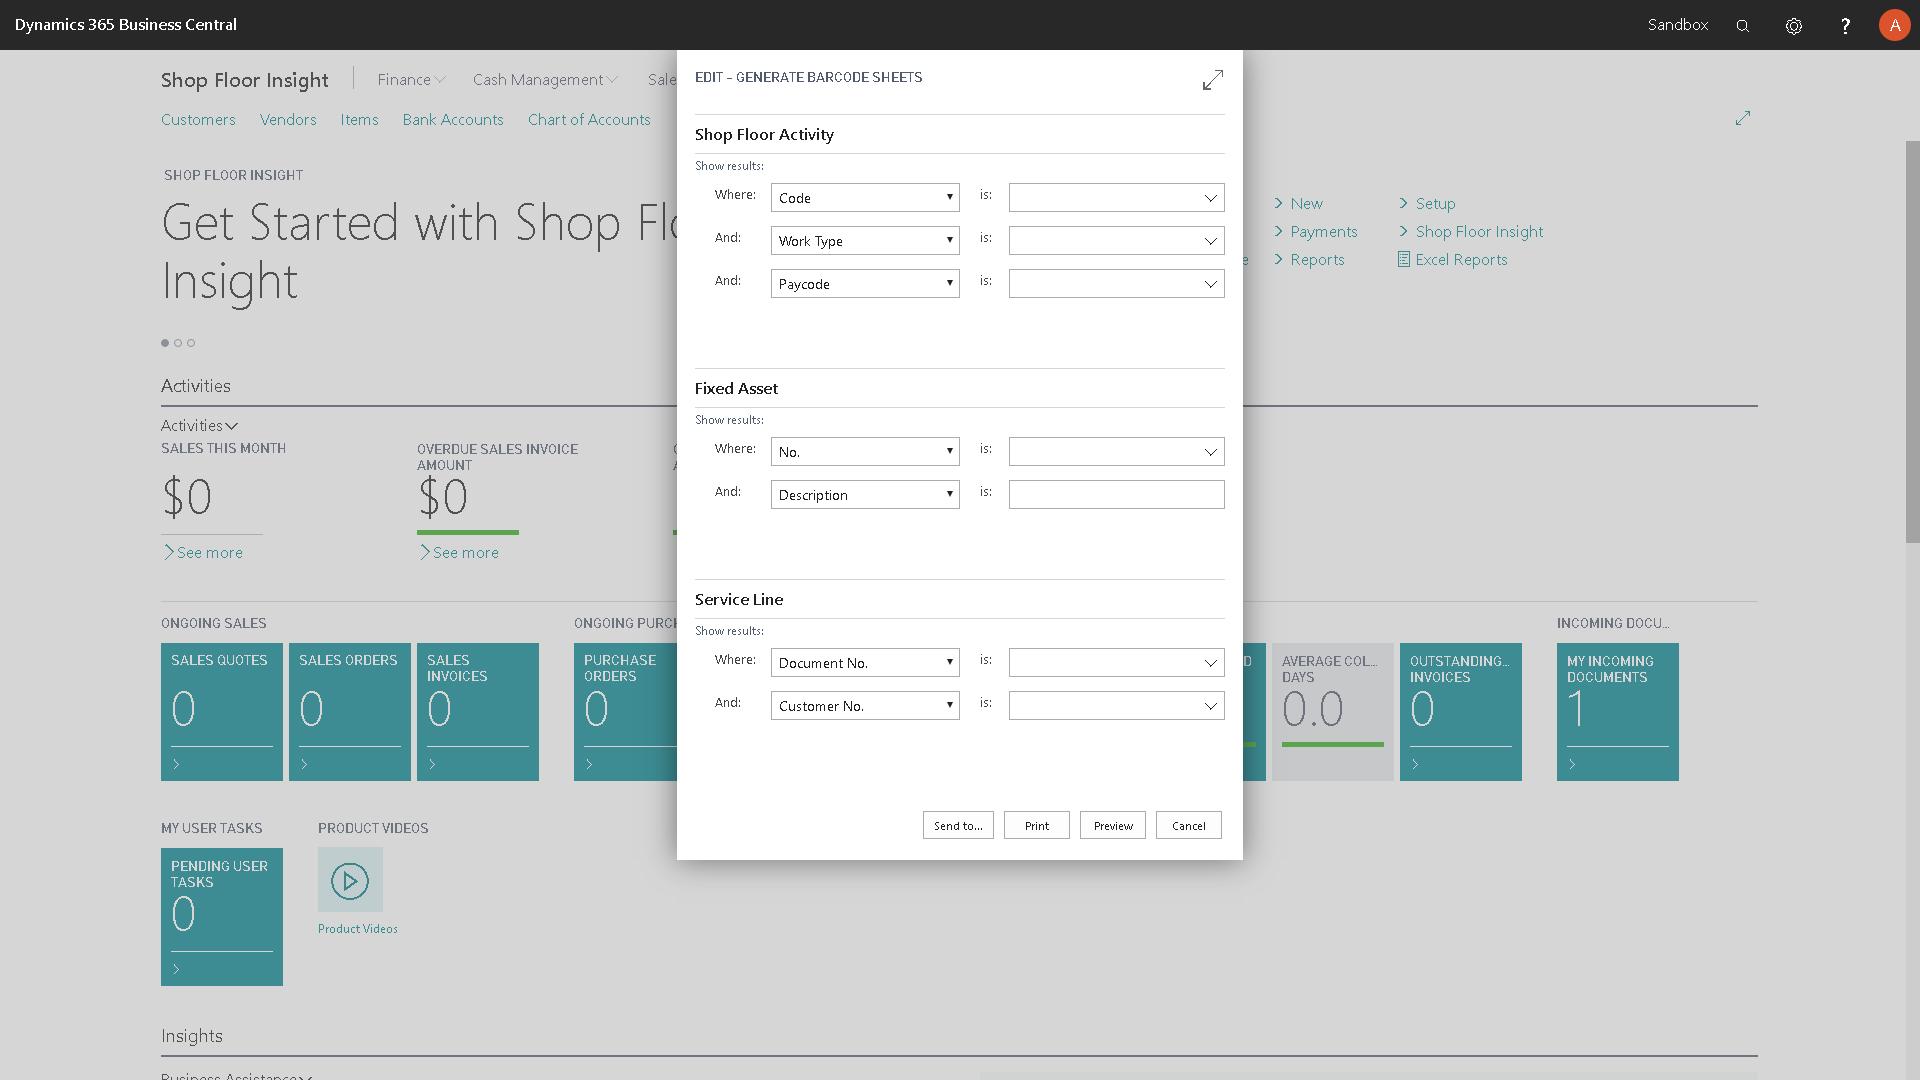 Generate Barcode Sheets